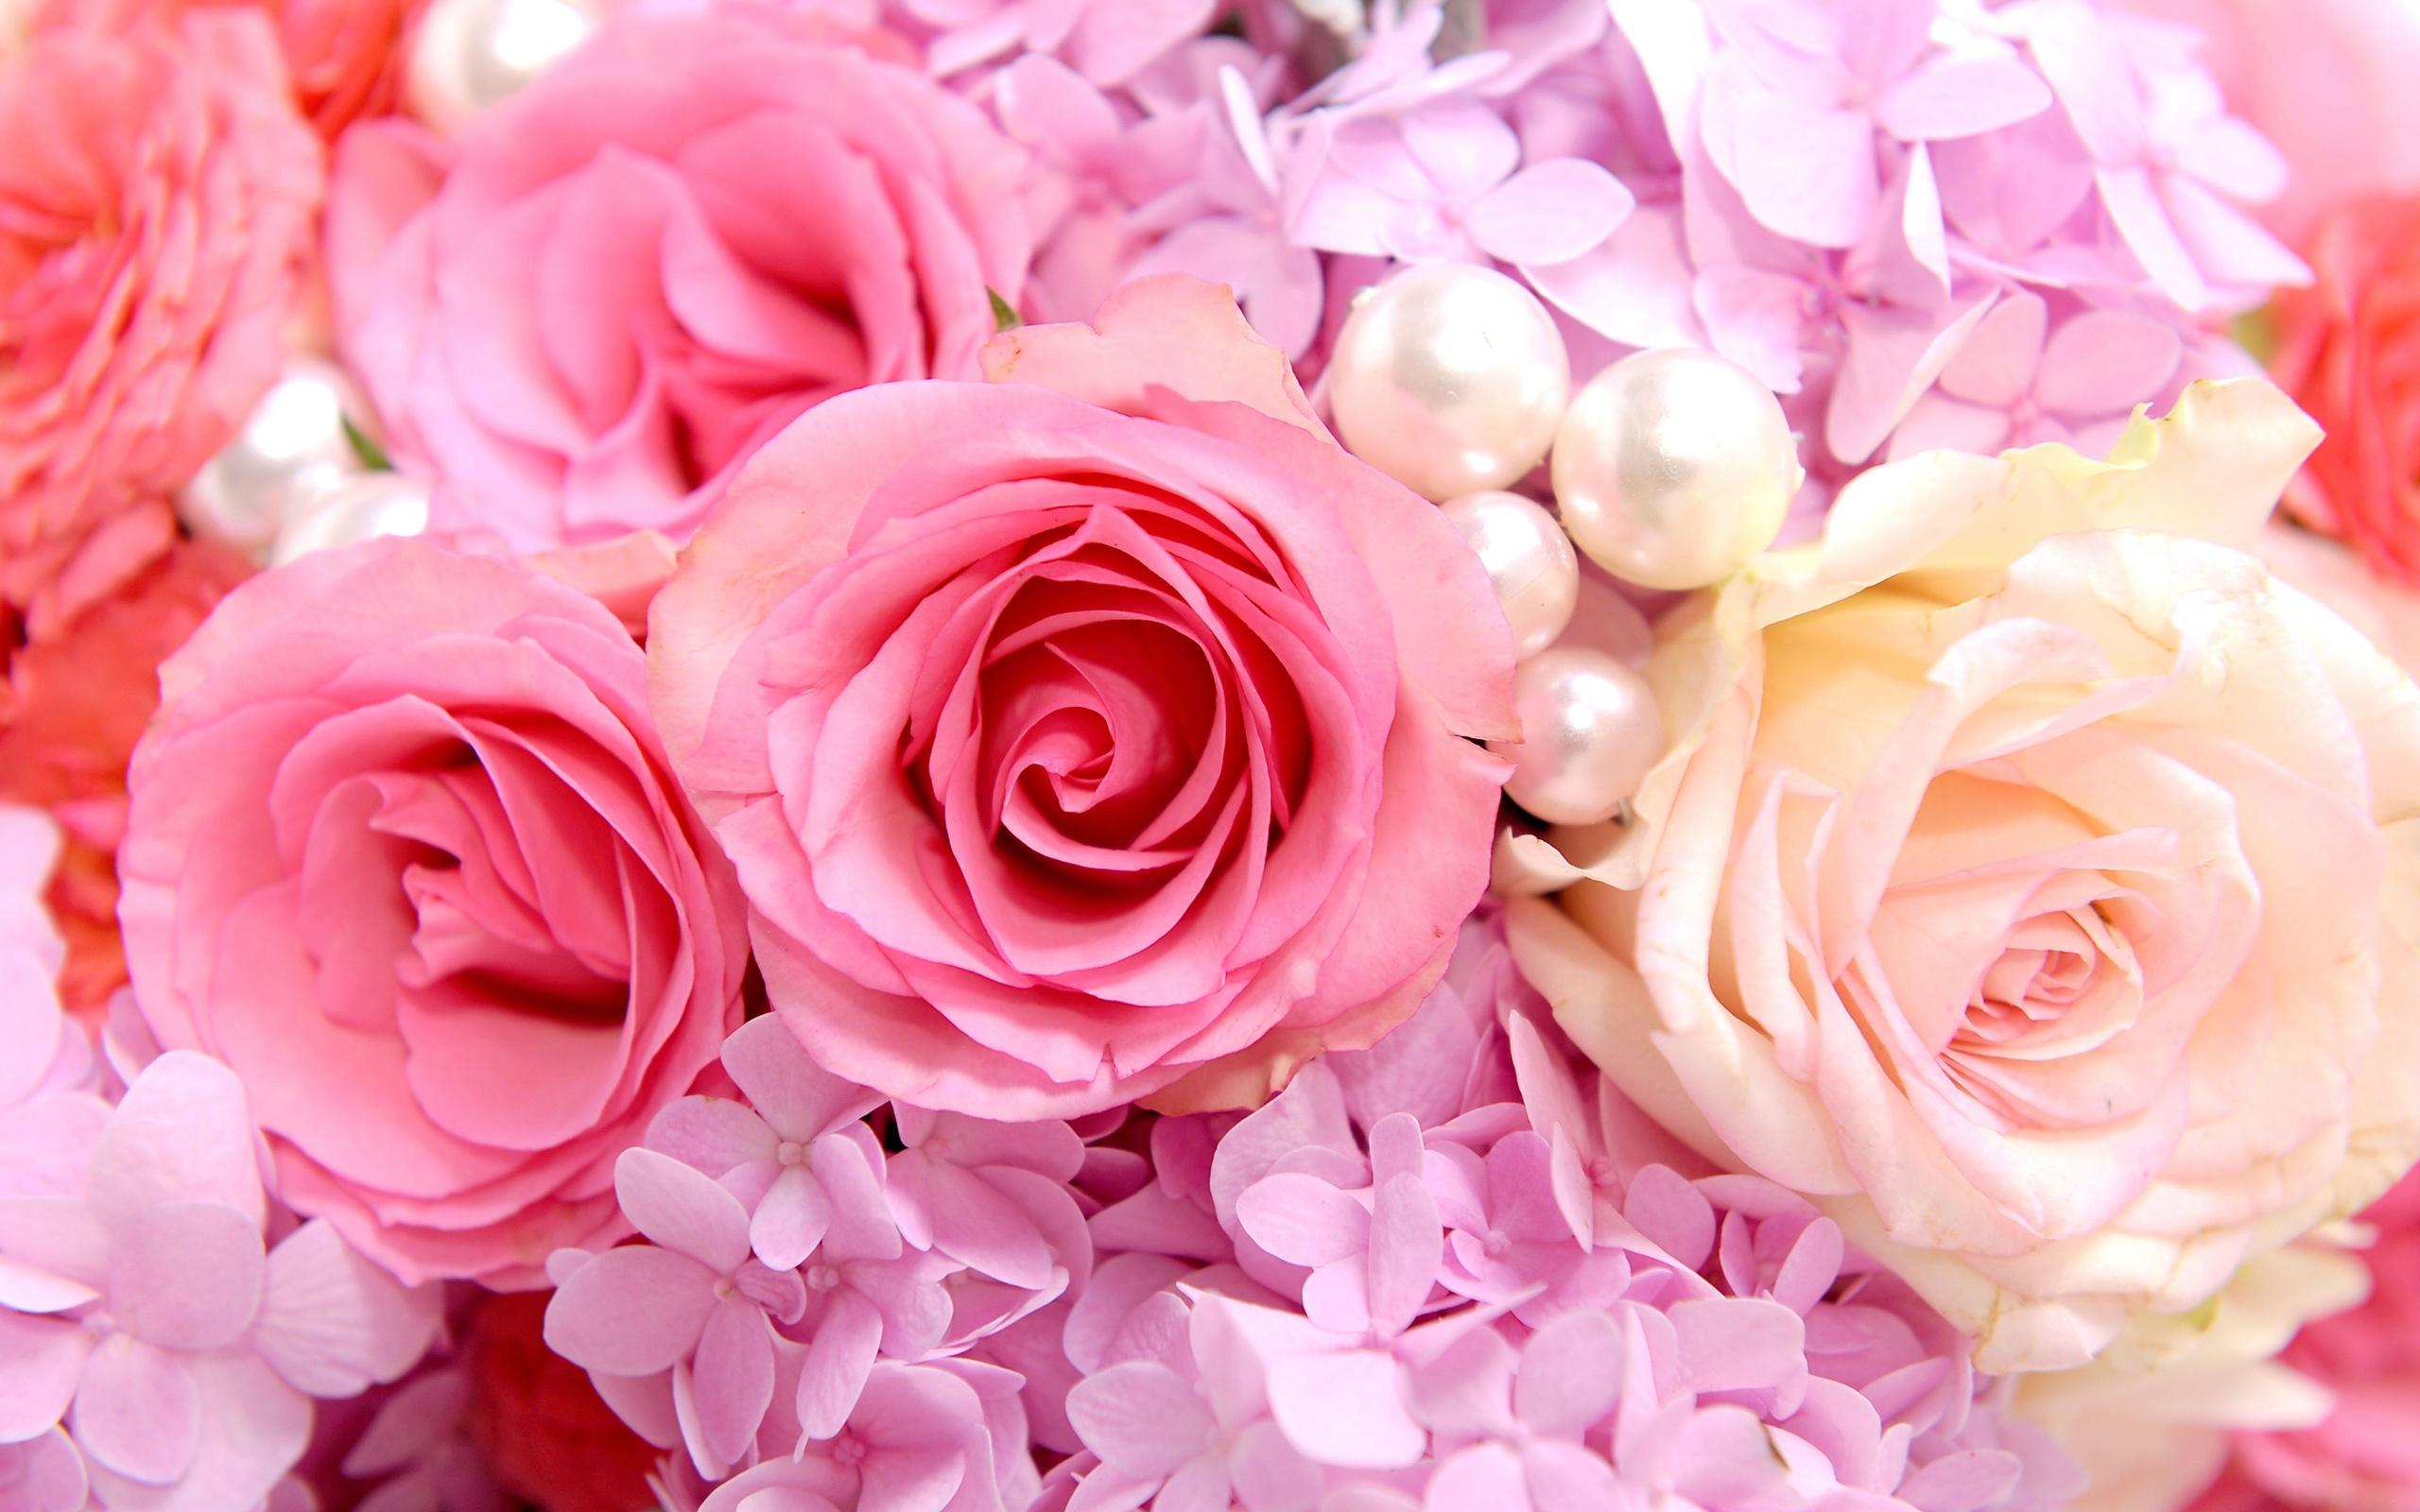 Fonds d 39 cran roses rose fond 2560x1600 hd image for Fond ecran rose